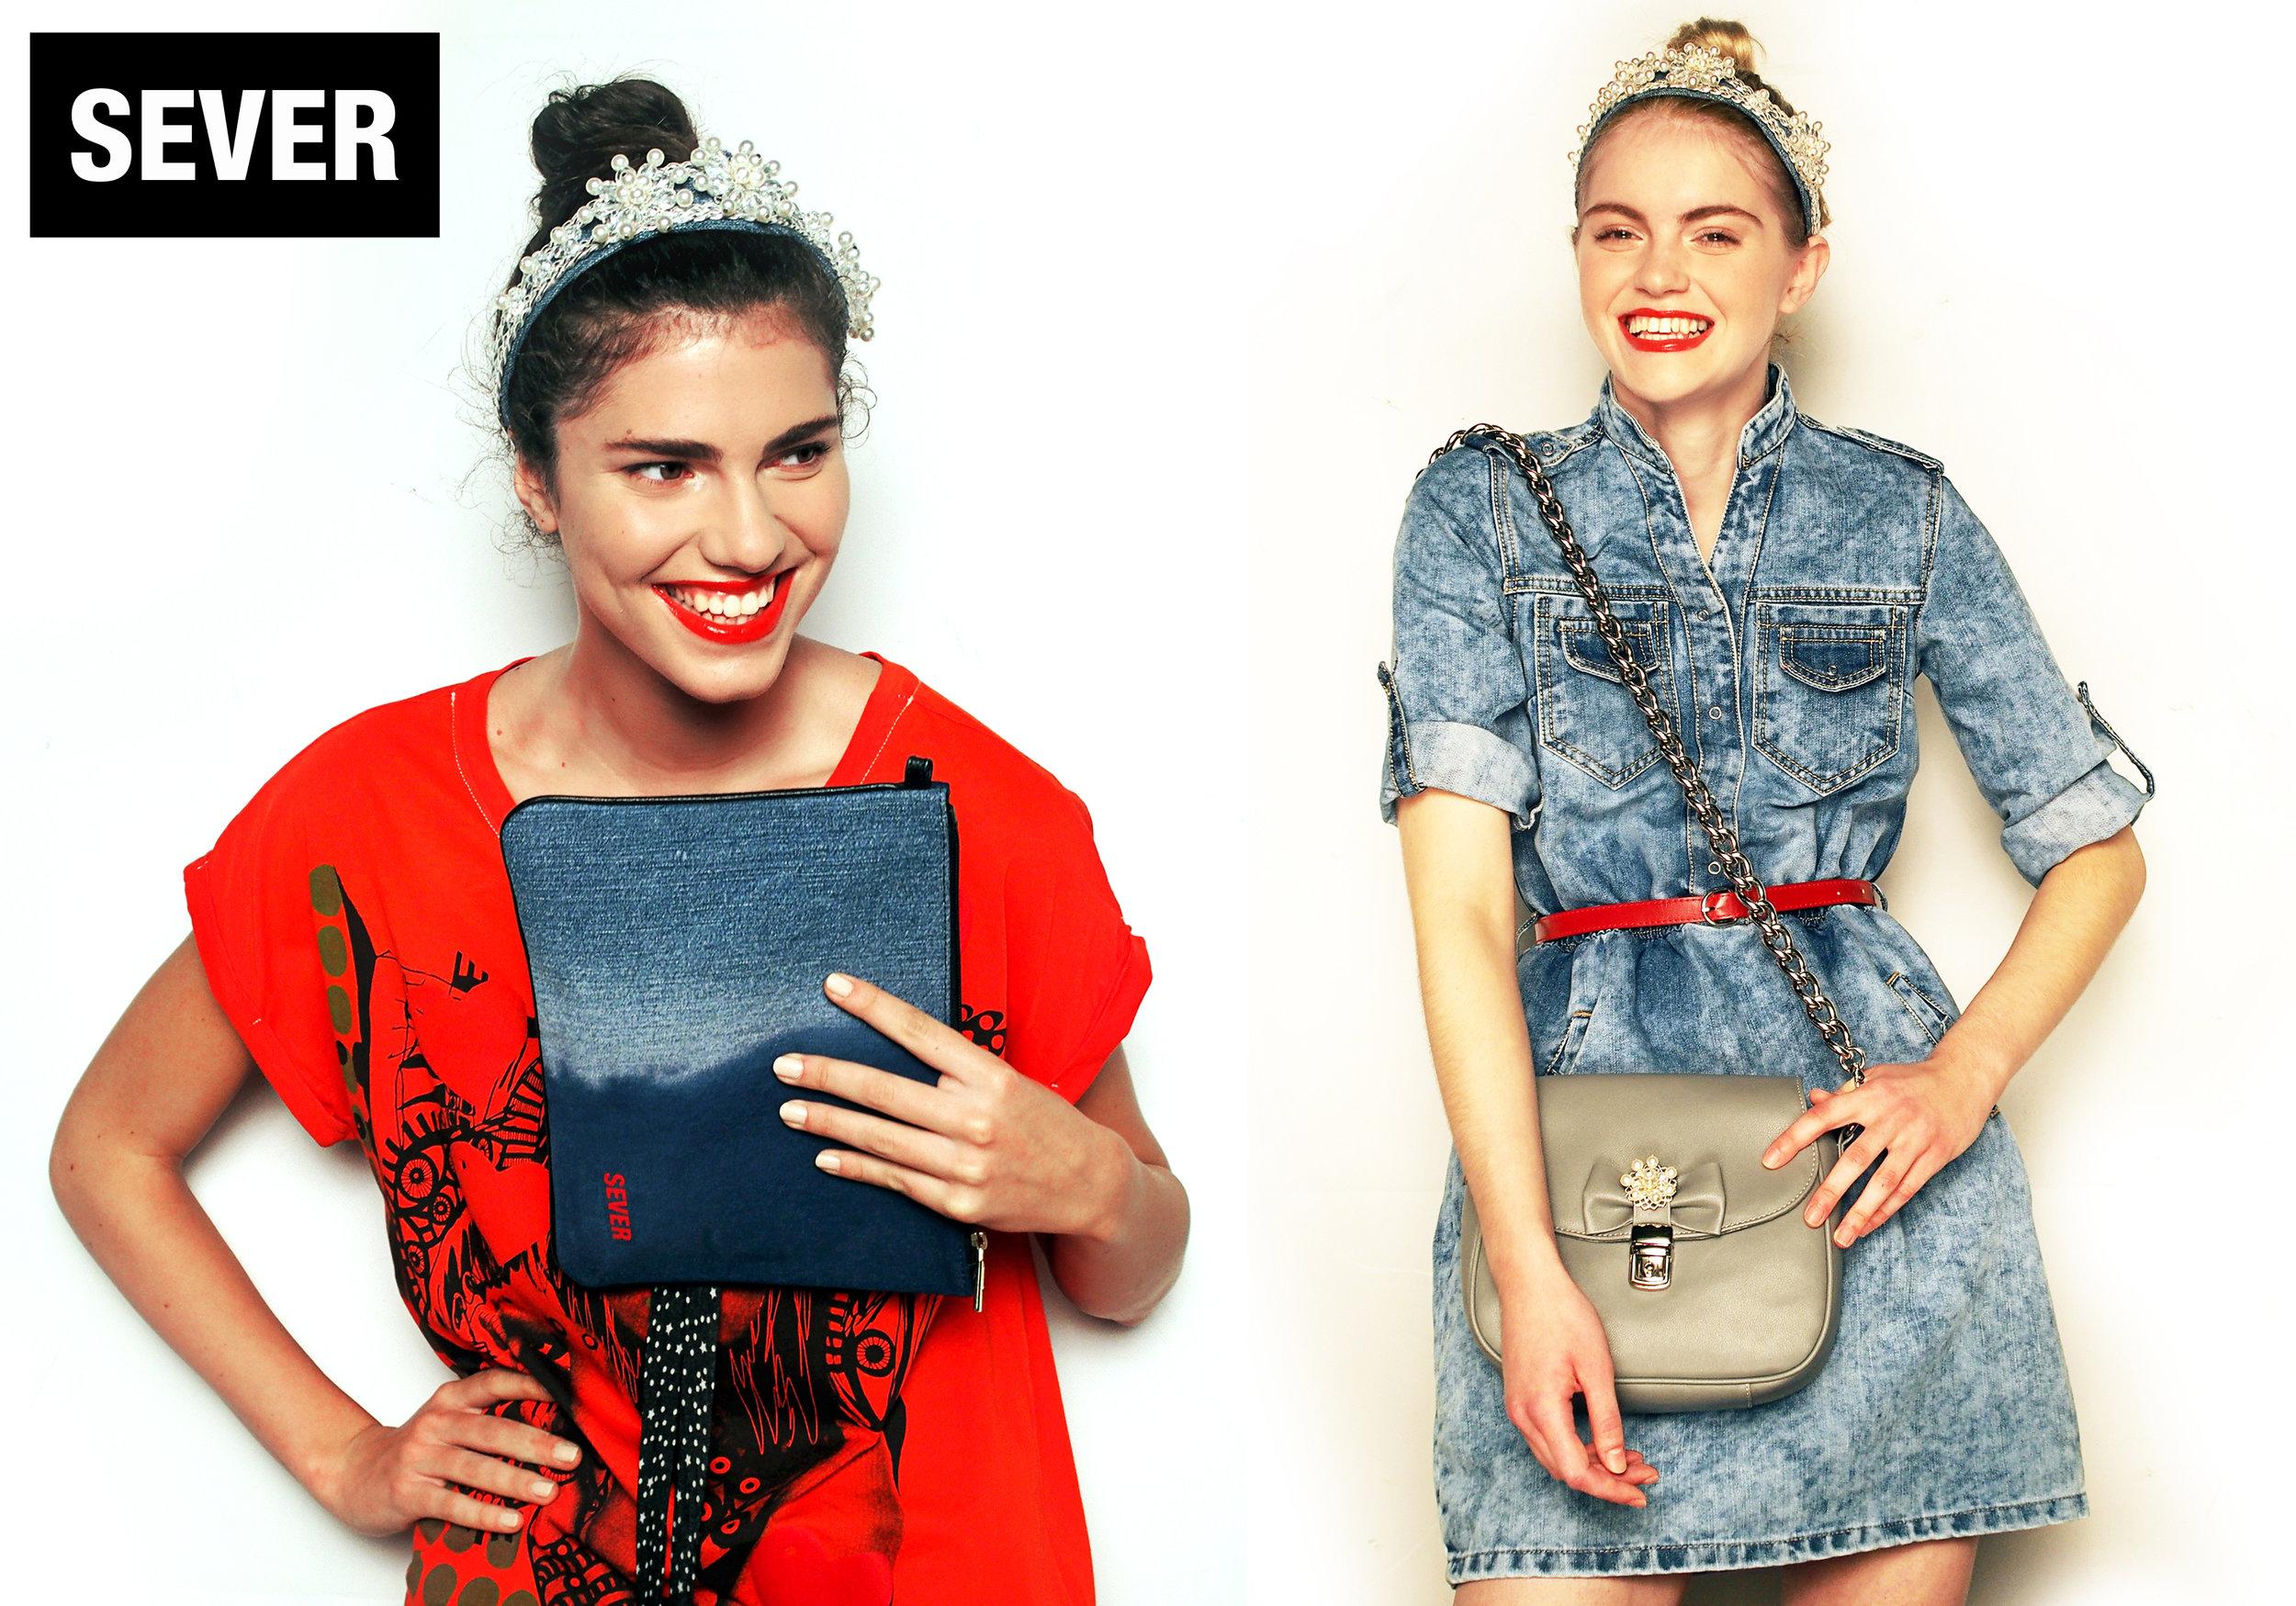 robert-sever-streetwear-kolekcija-2016 (7).jpg